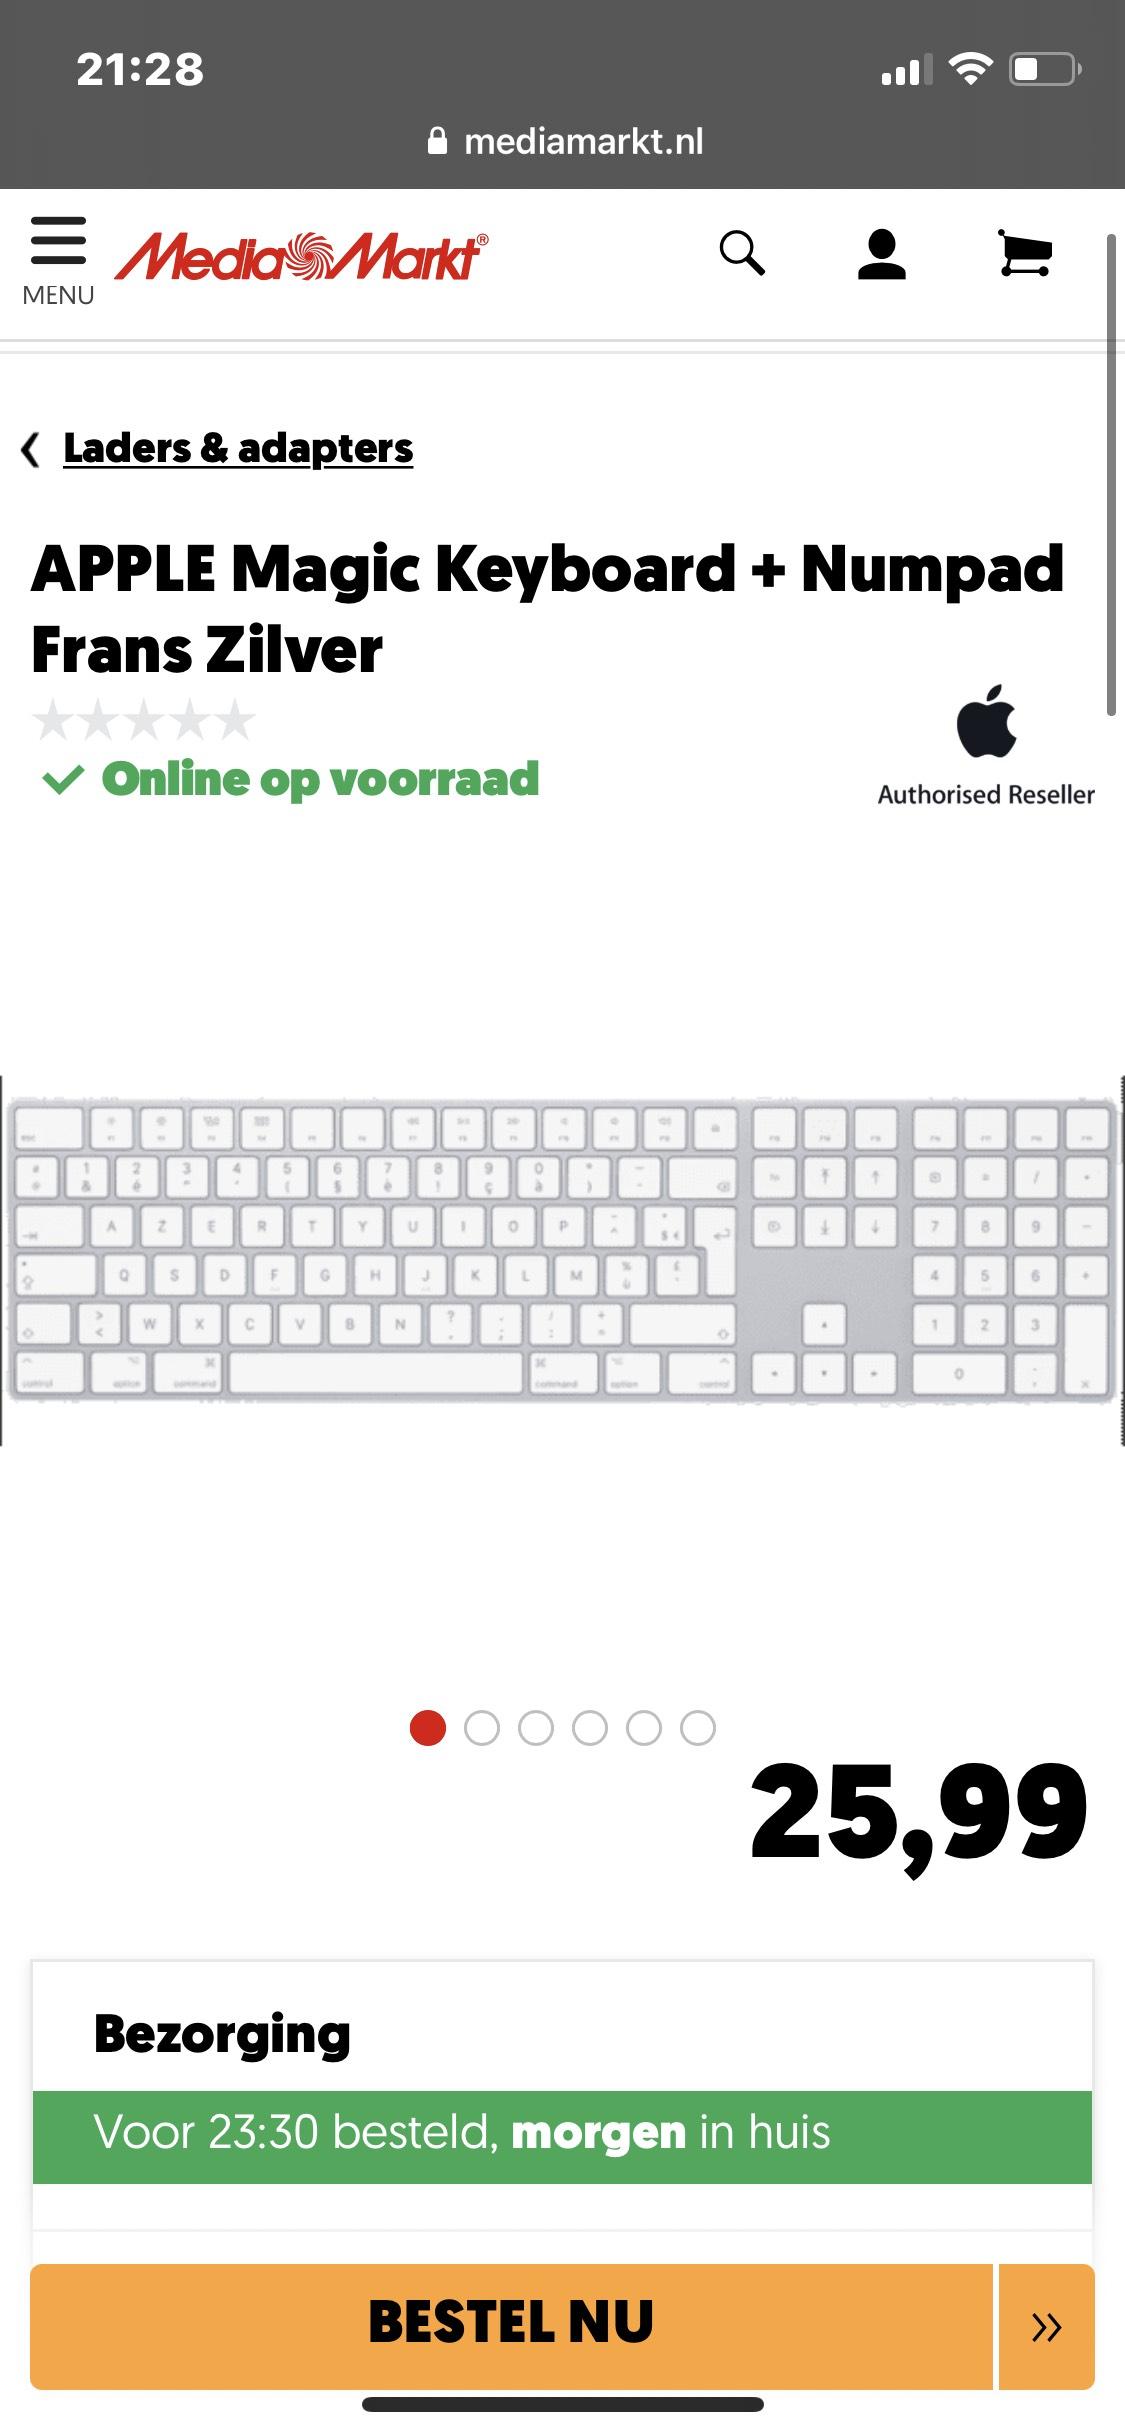 Apple magic keyboard+numpad frans AZERTY (prijsfout??)